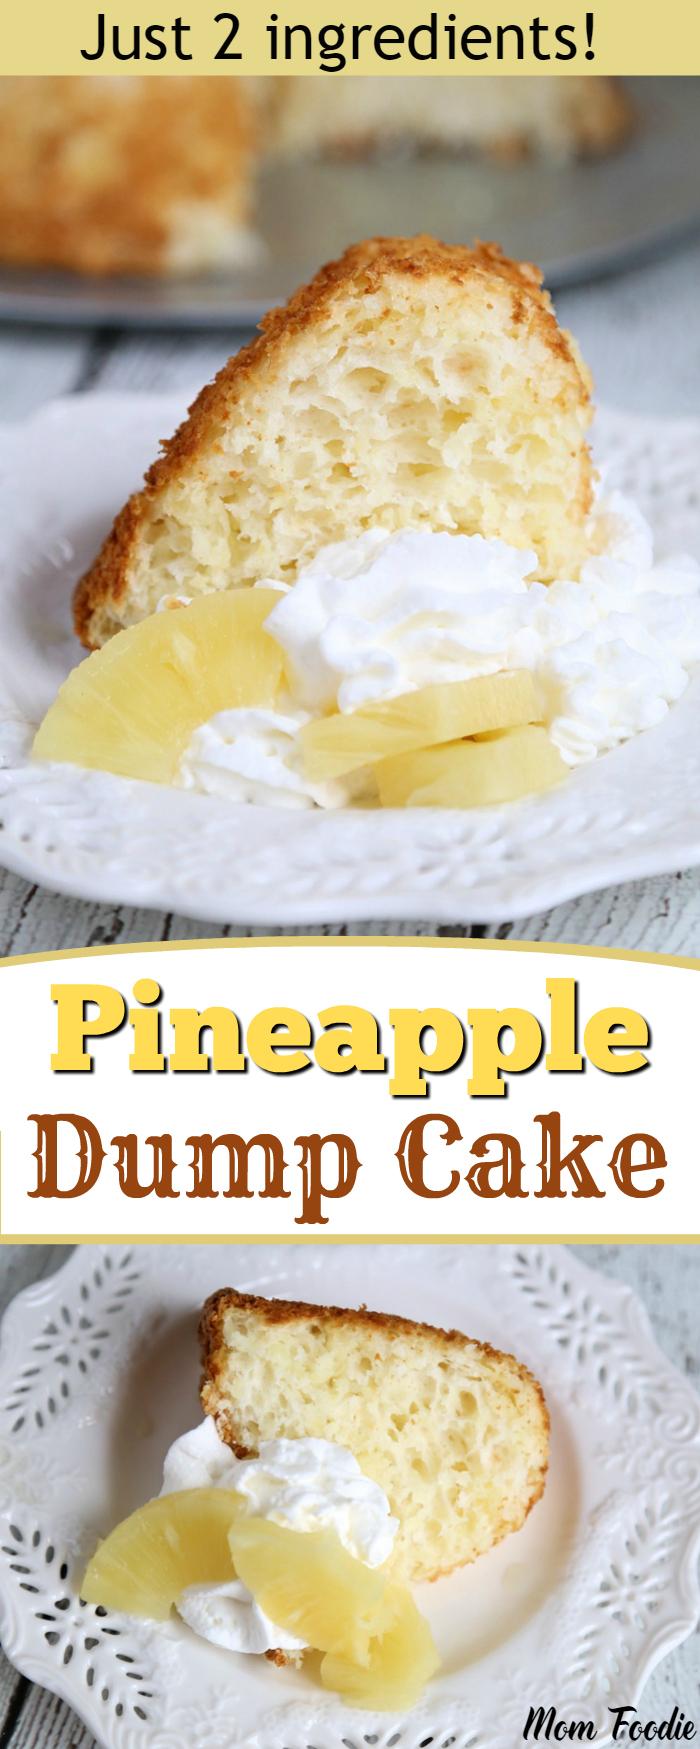 Ingredient Pineapple Bundt Cake